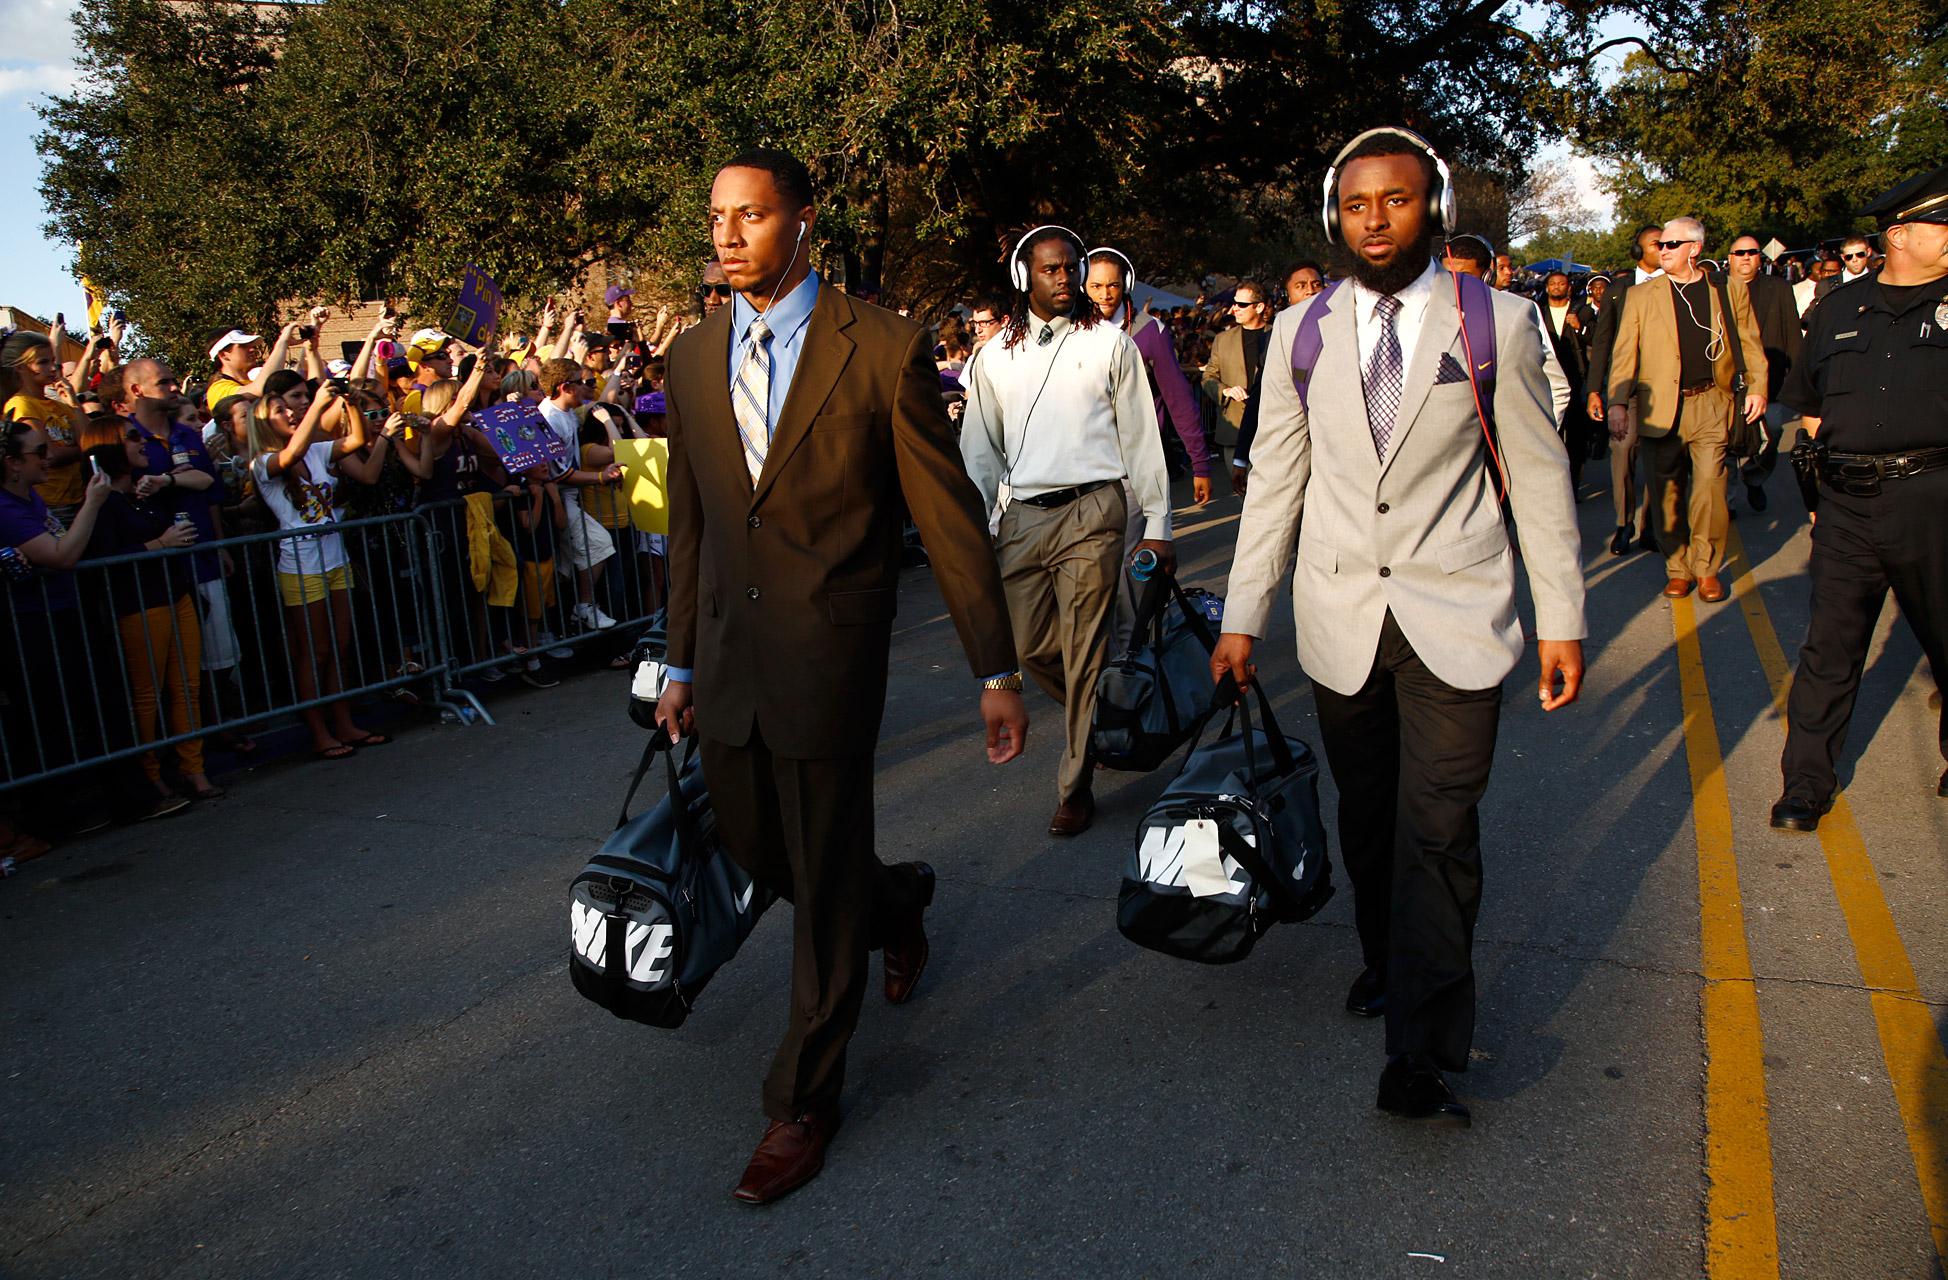 LSU Players Walking In